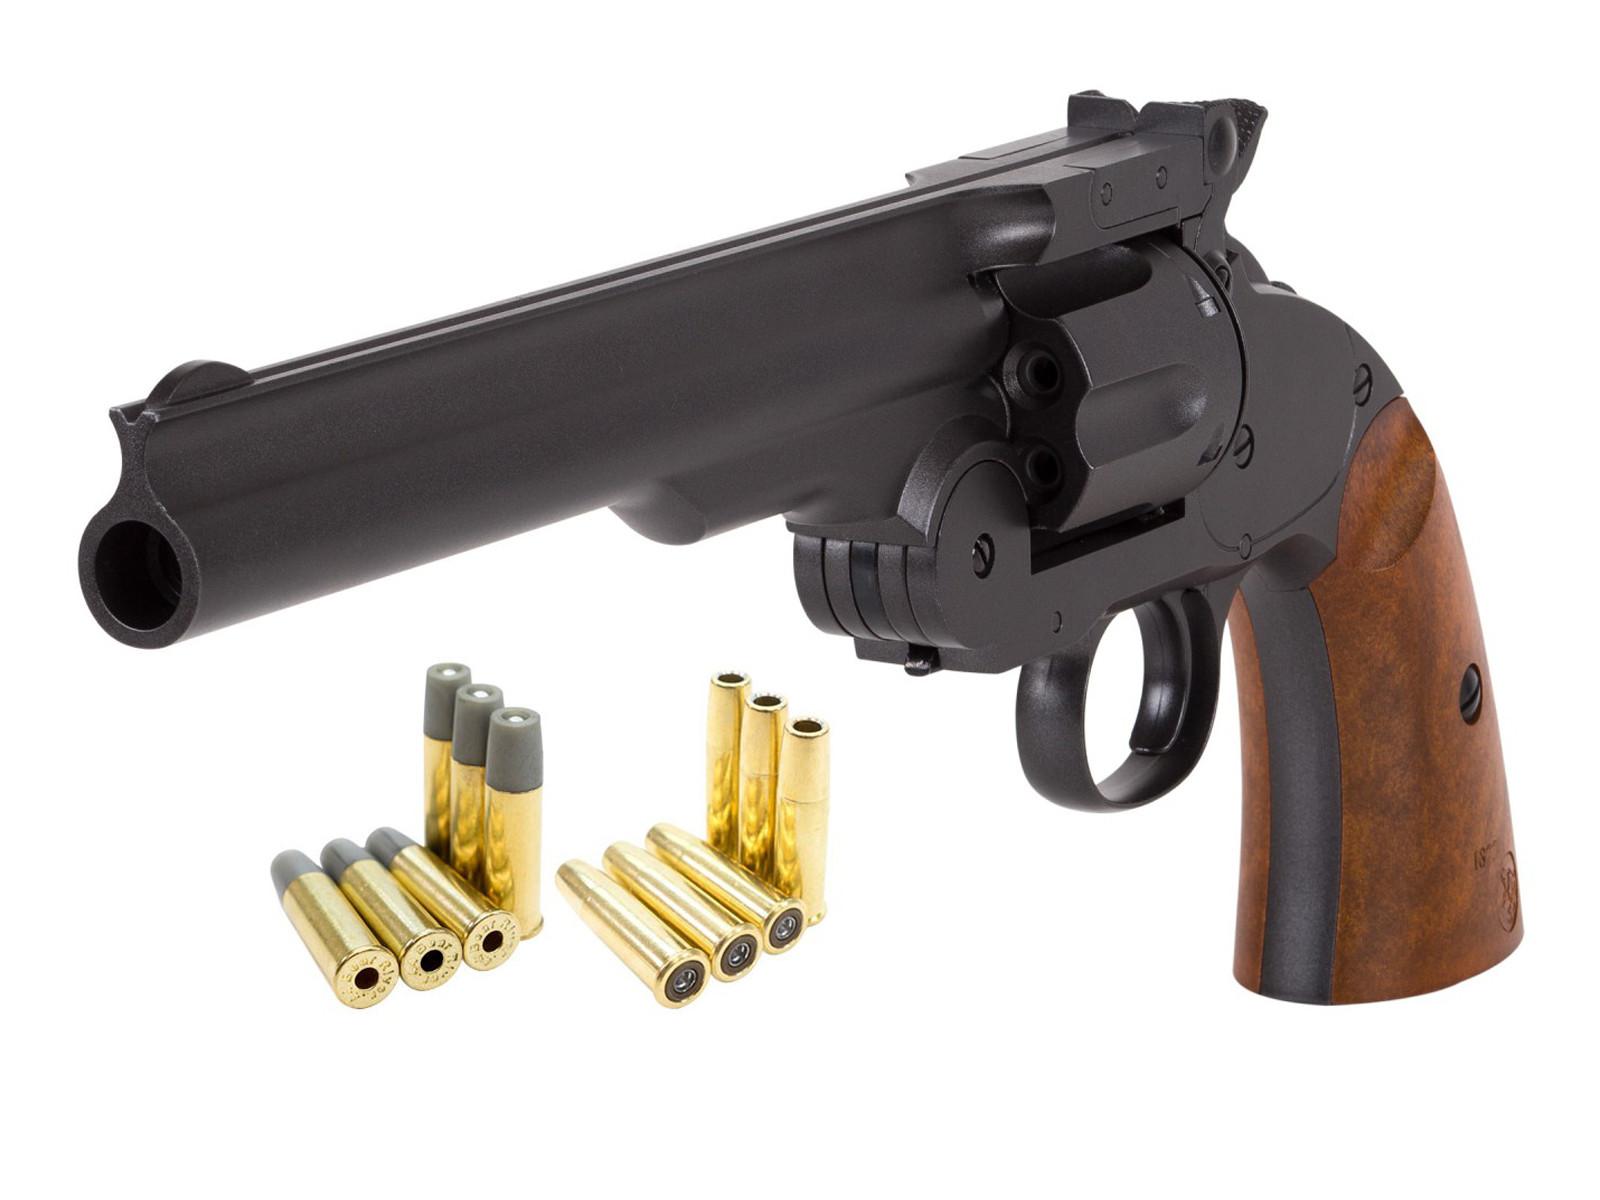 Barra Schofield No. 3 Dual Ammo CO2 Gun Kit